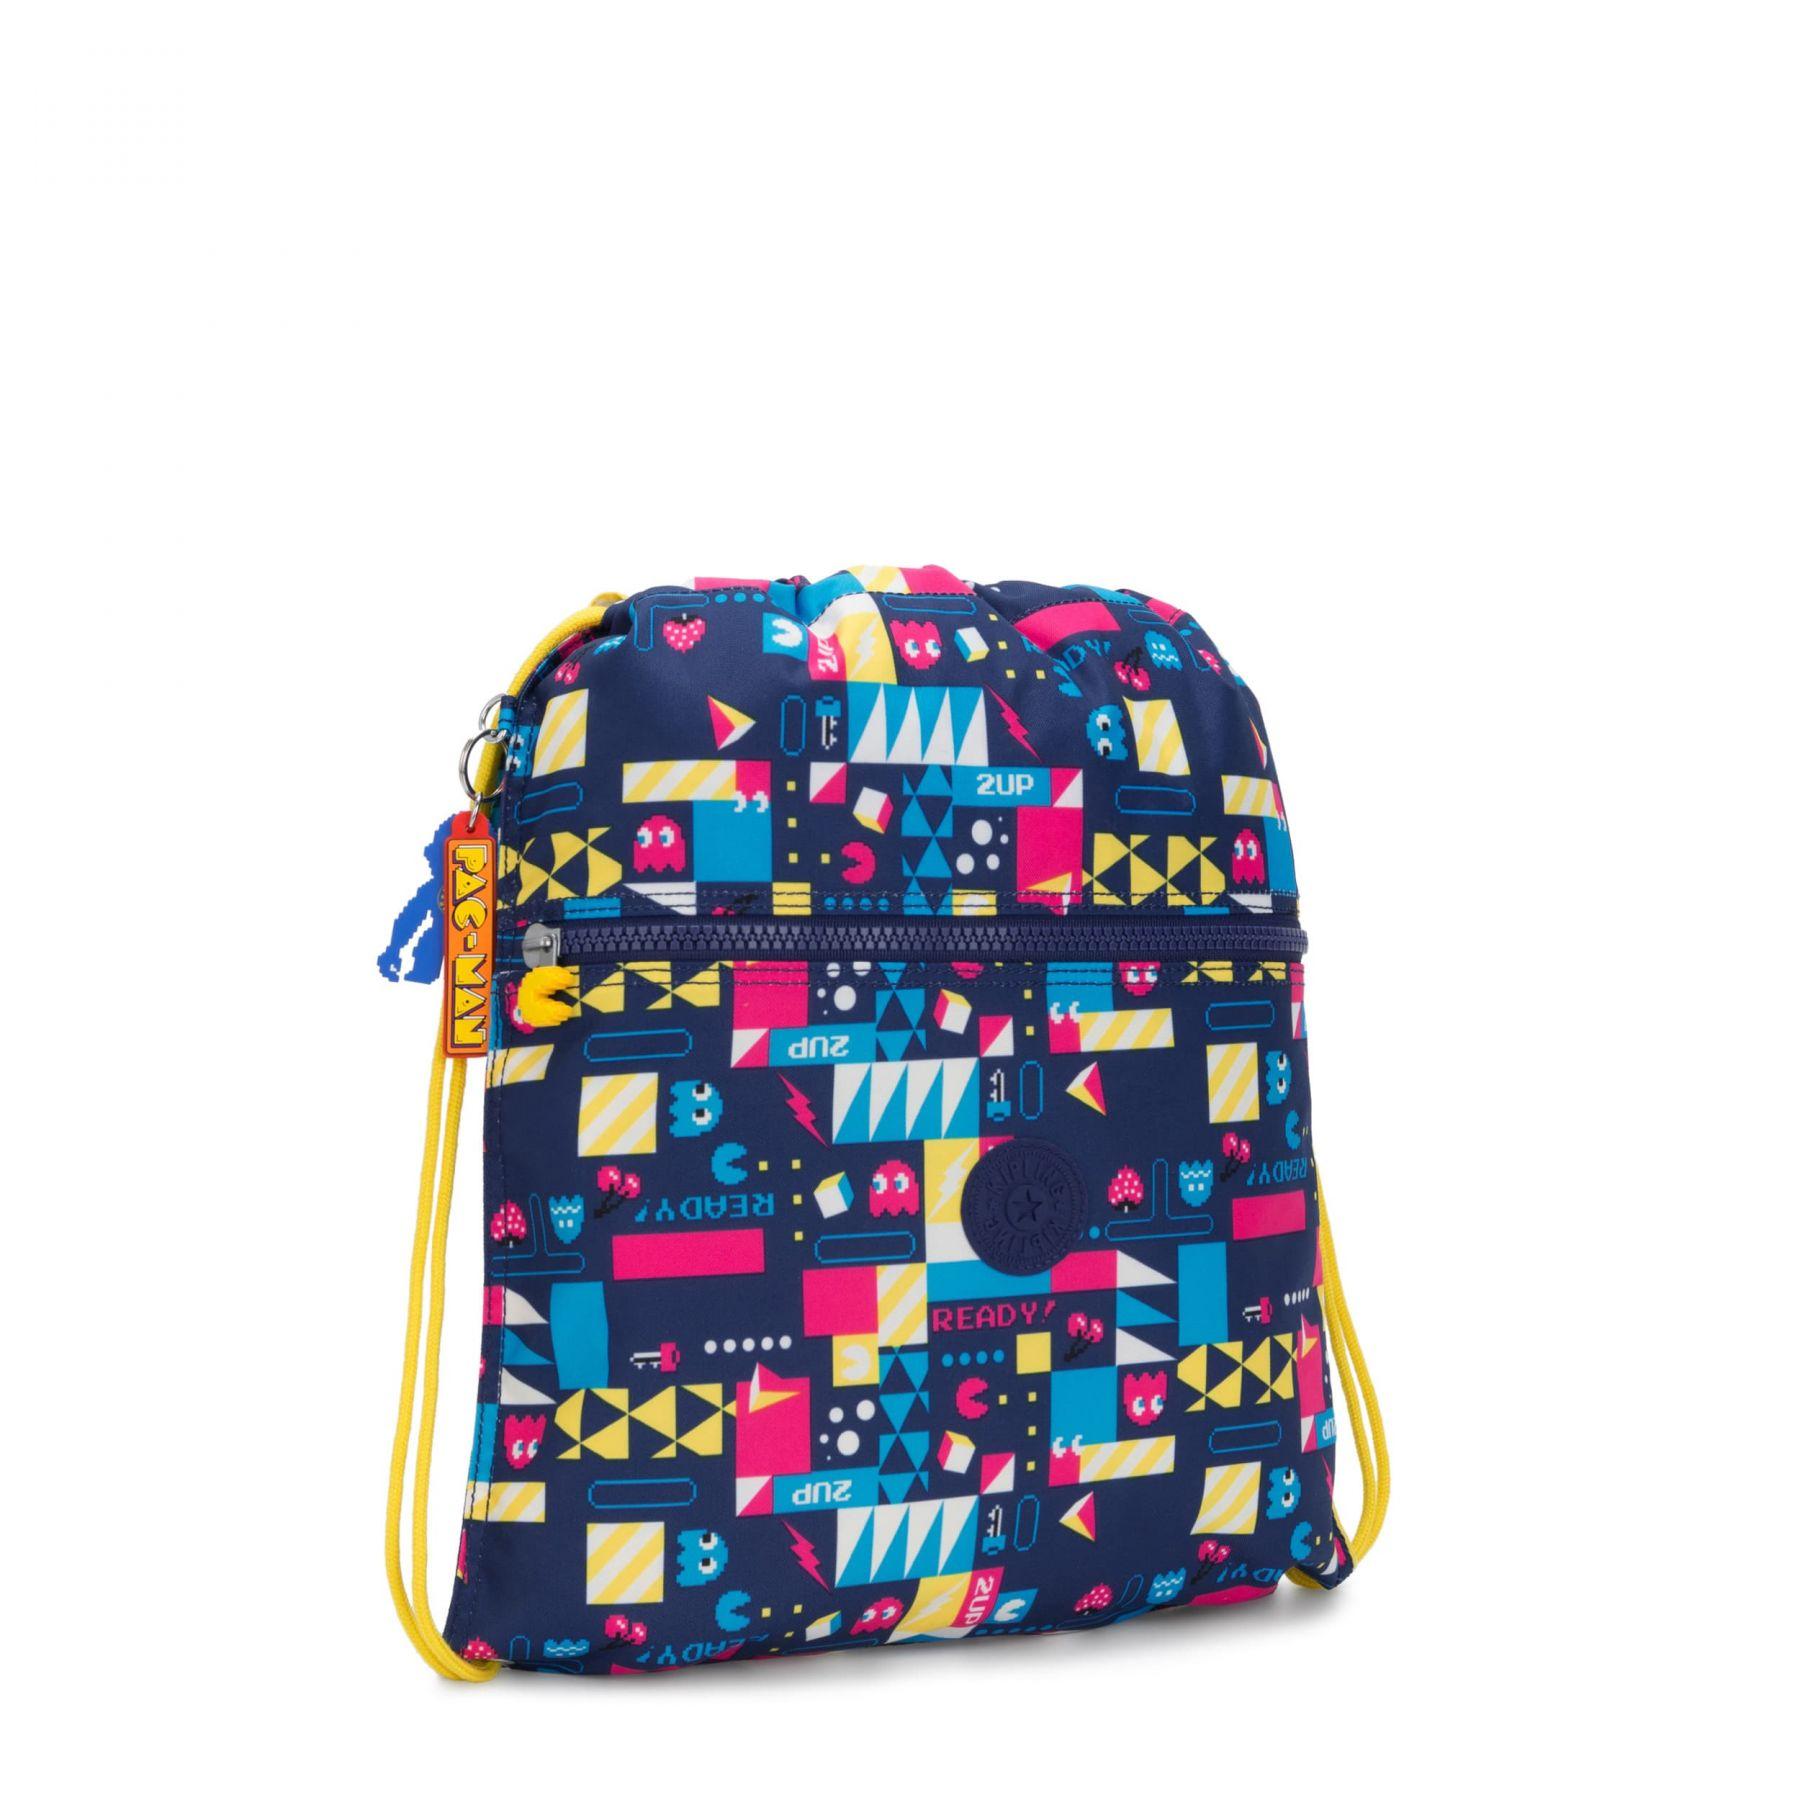 SUPERTABOO Latest Backpacks by Kipling